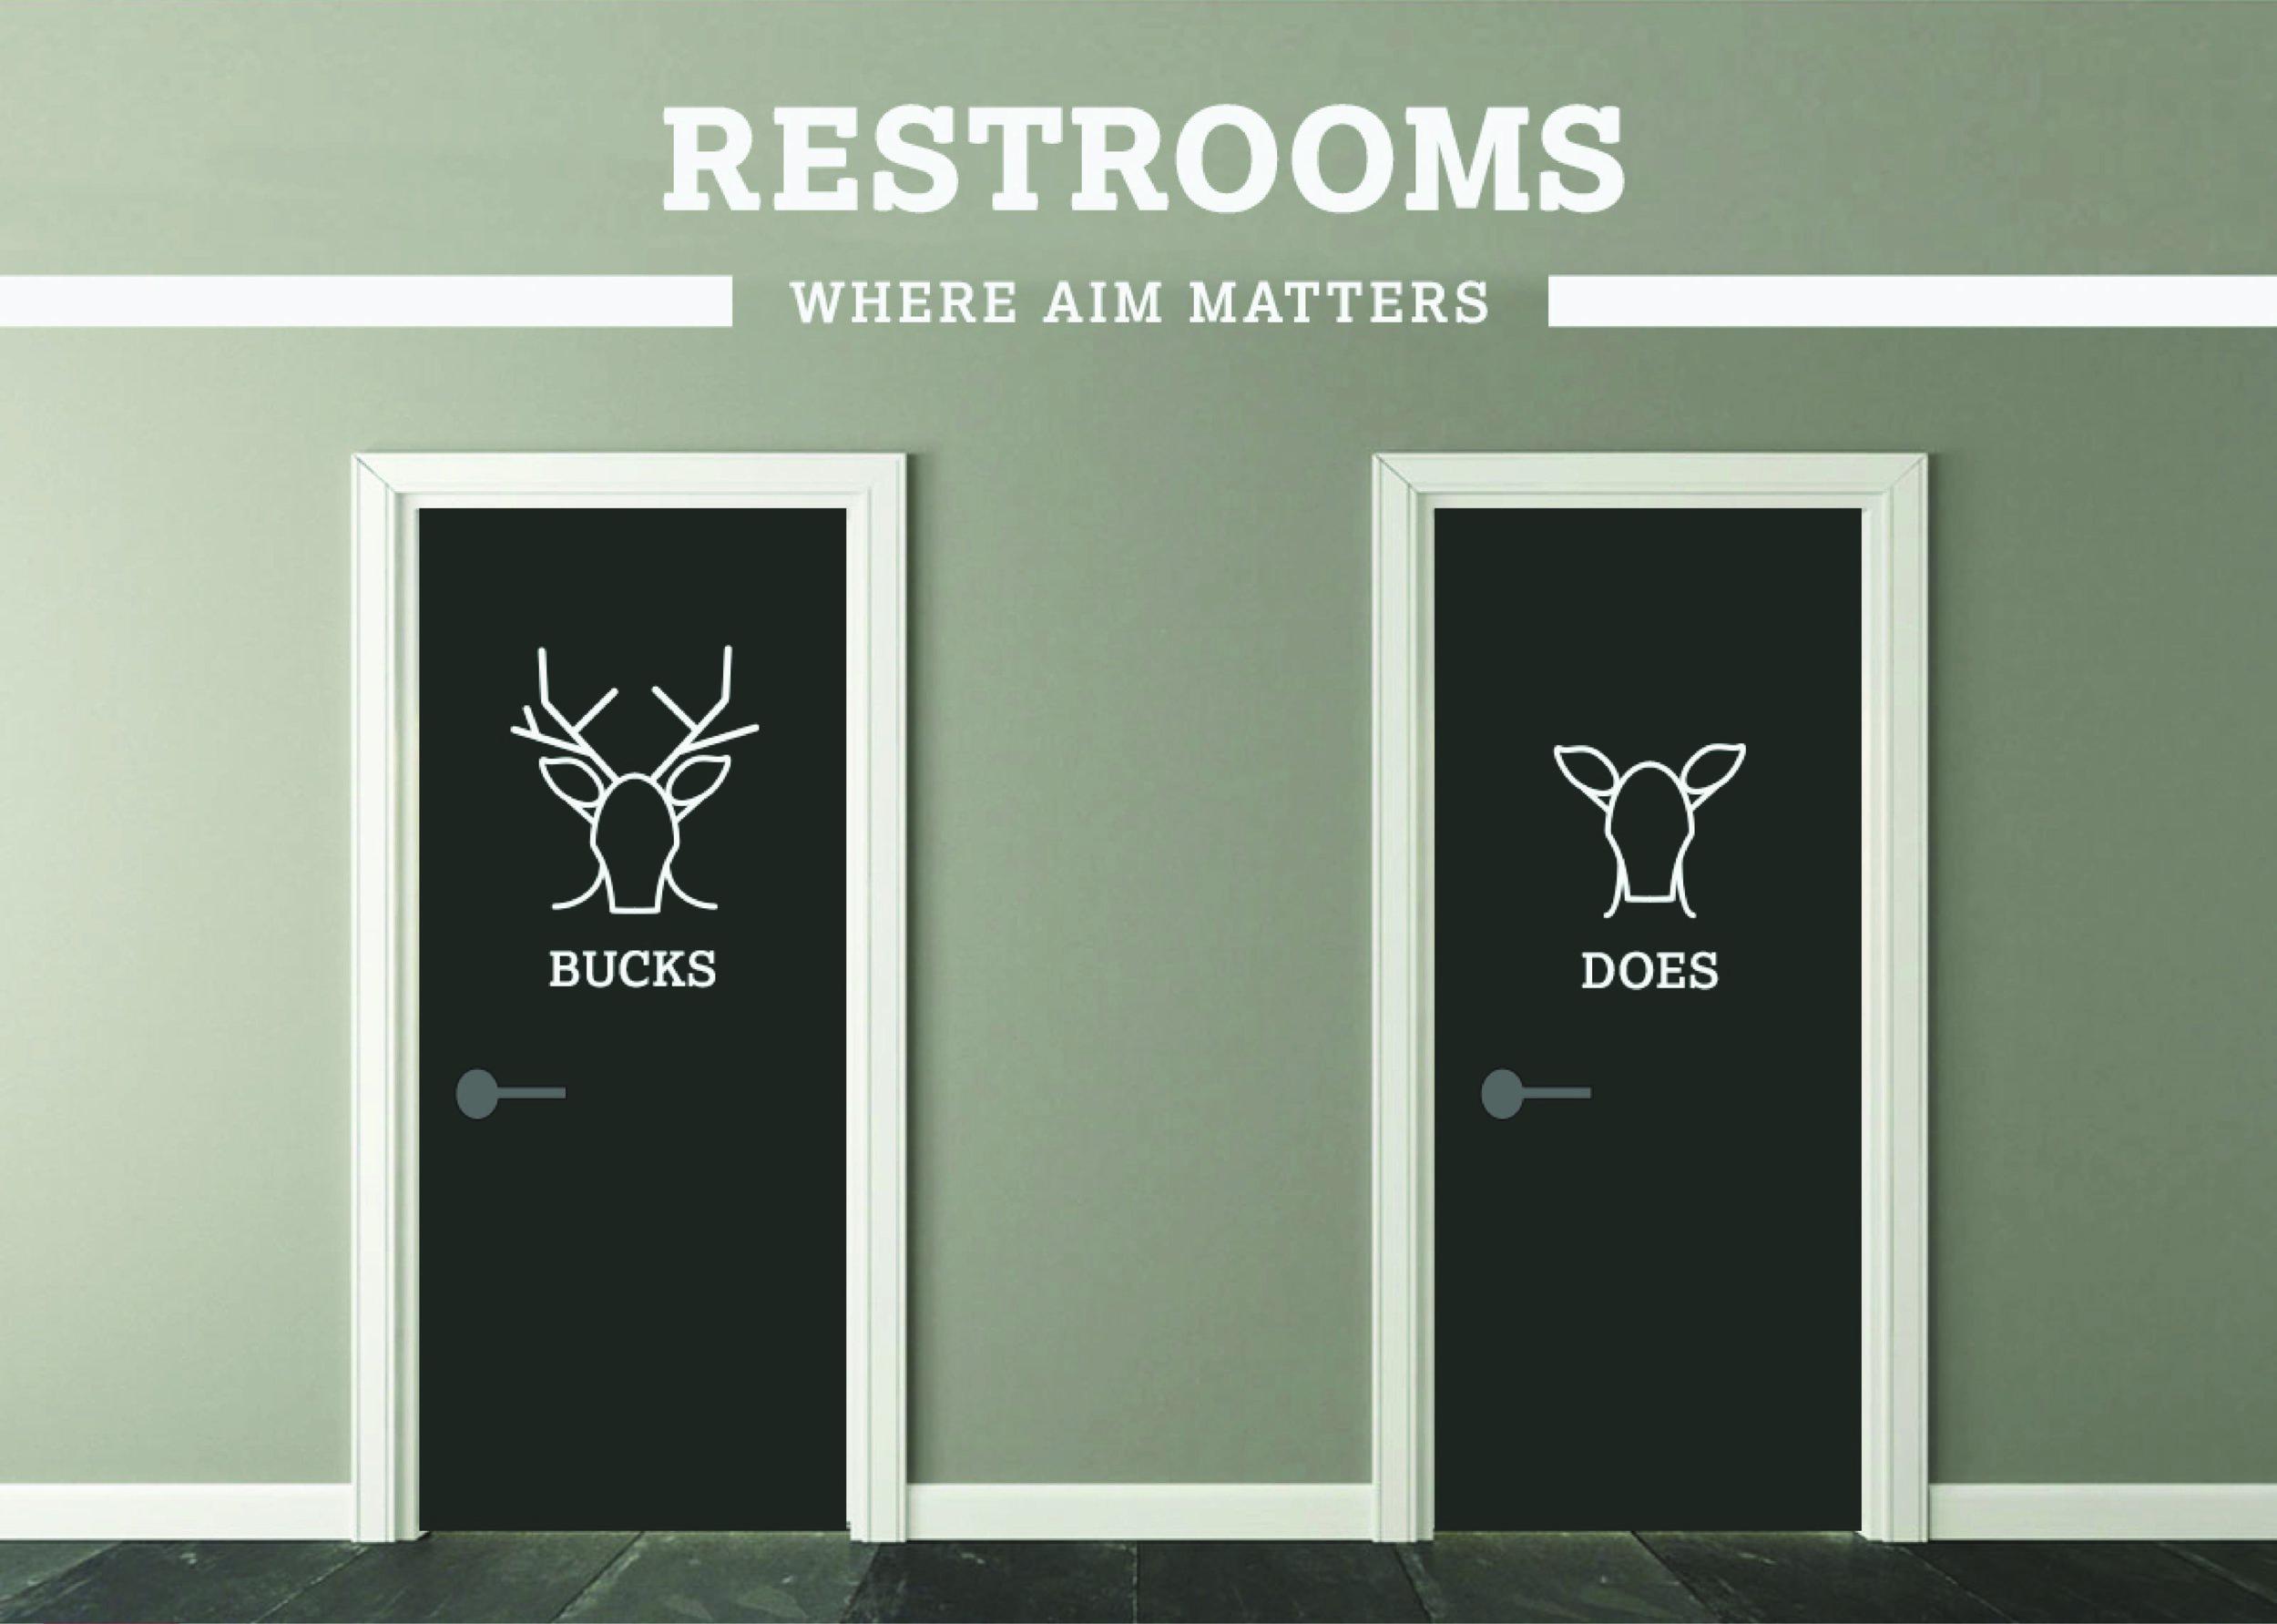 aim matters-03.jpg